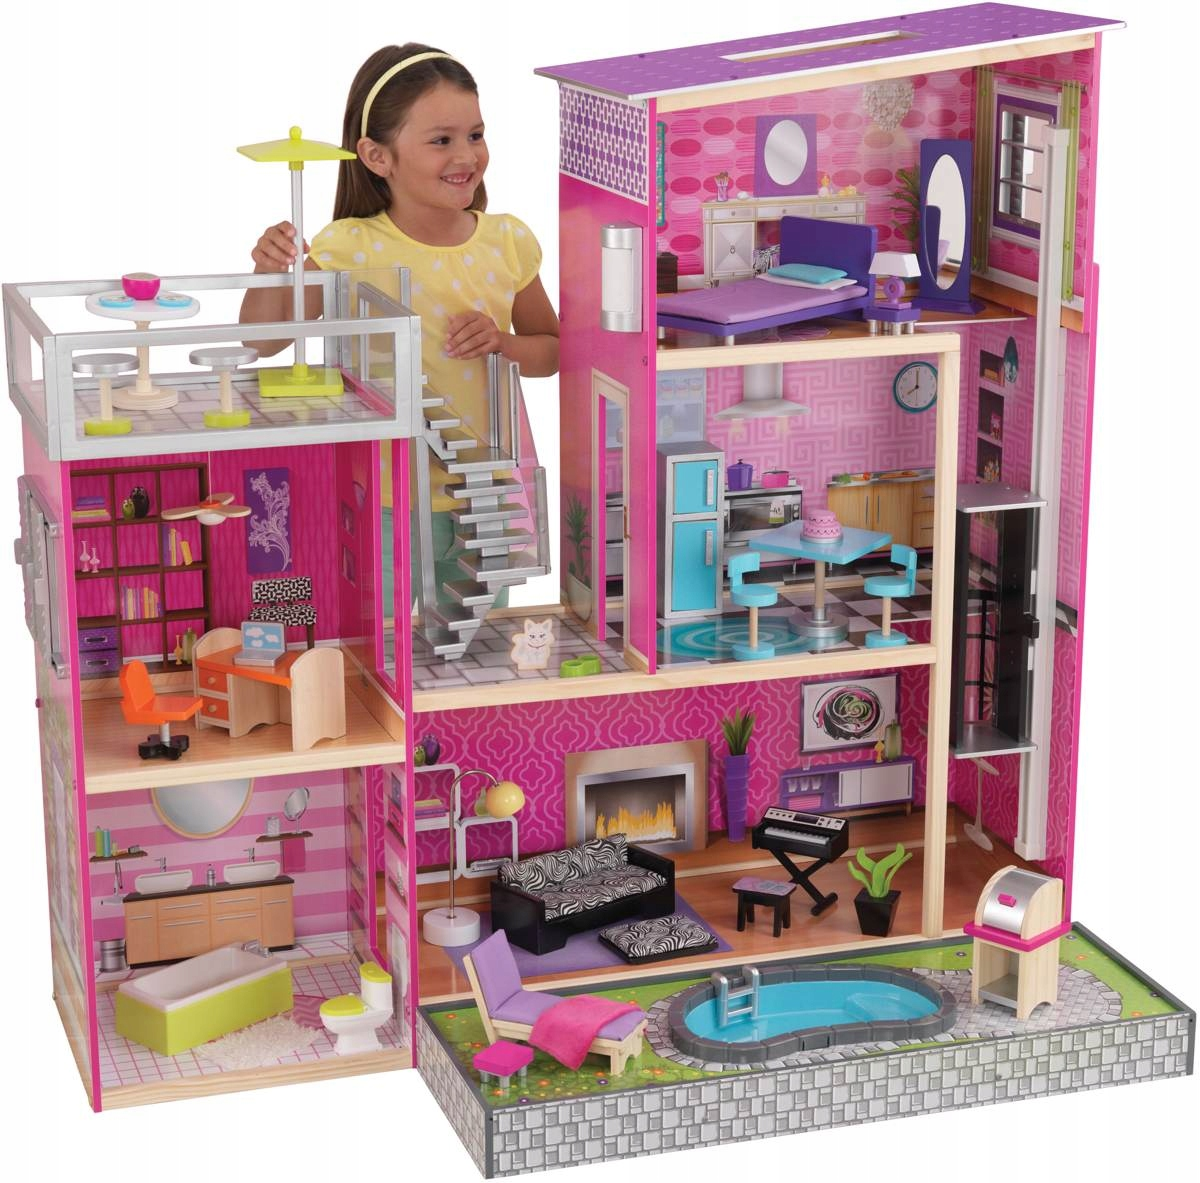 Dollhouse KidKraft Luxury Residence